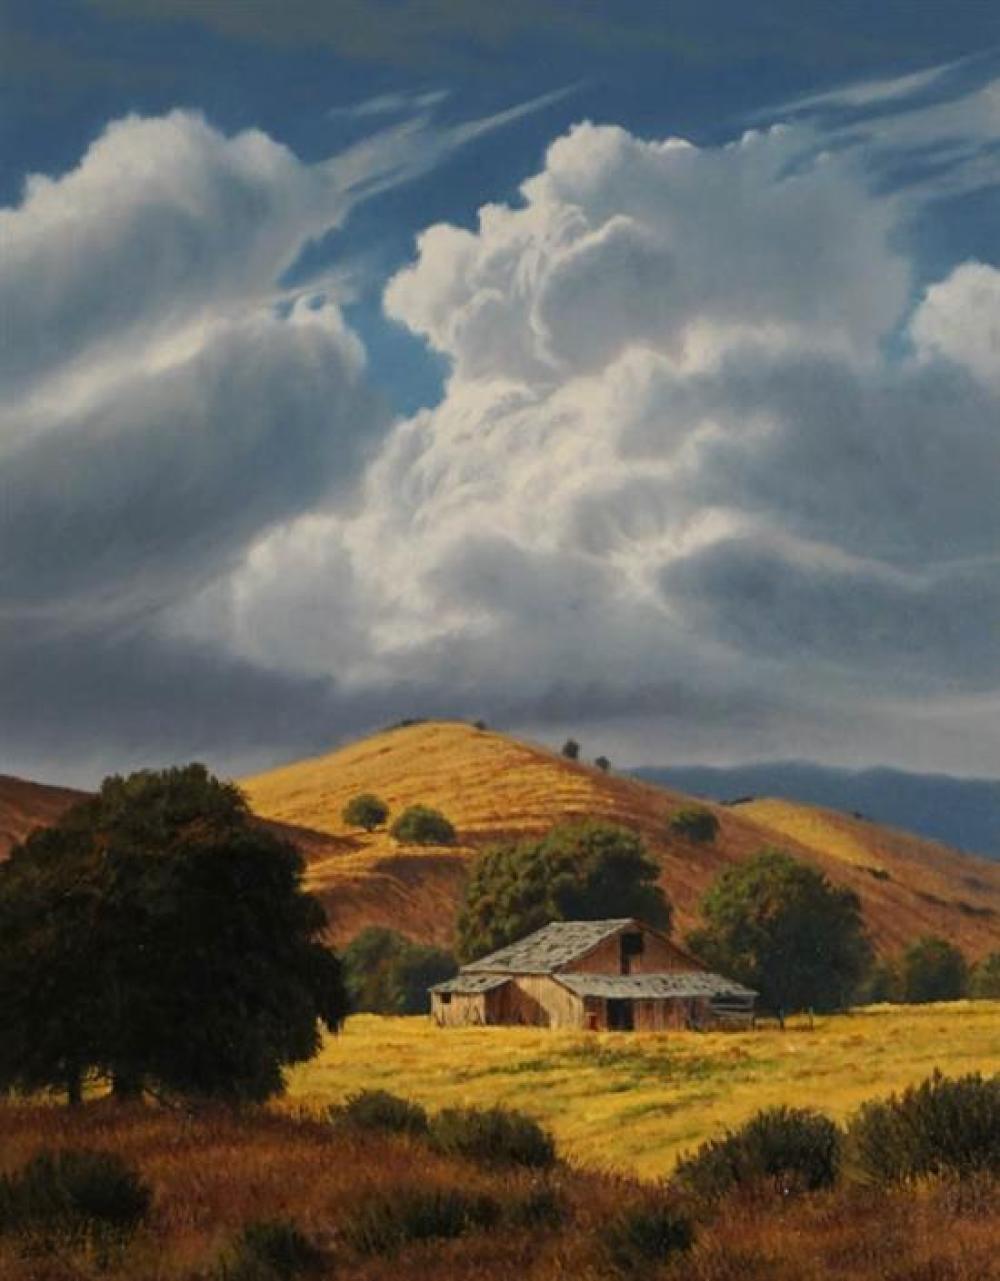 Mark Geller (American b. 1947), Barn in a Hilly Landscape